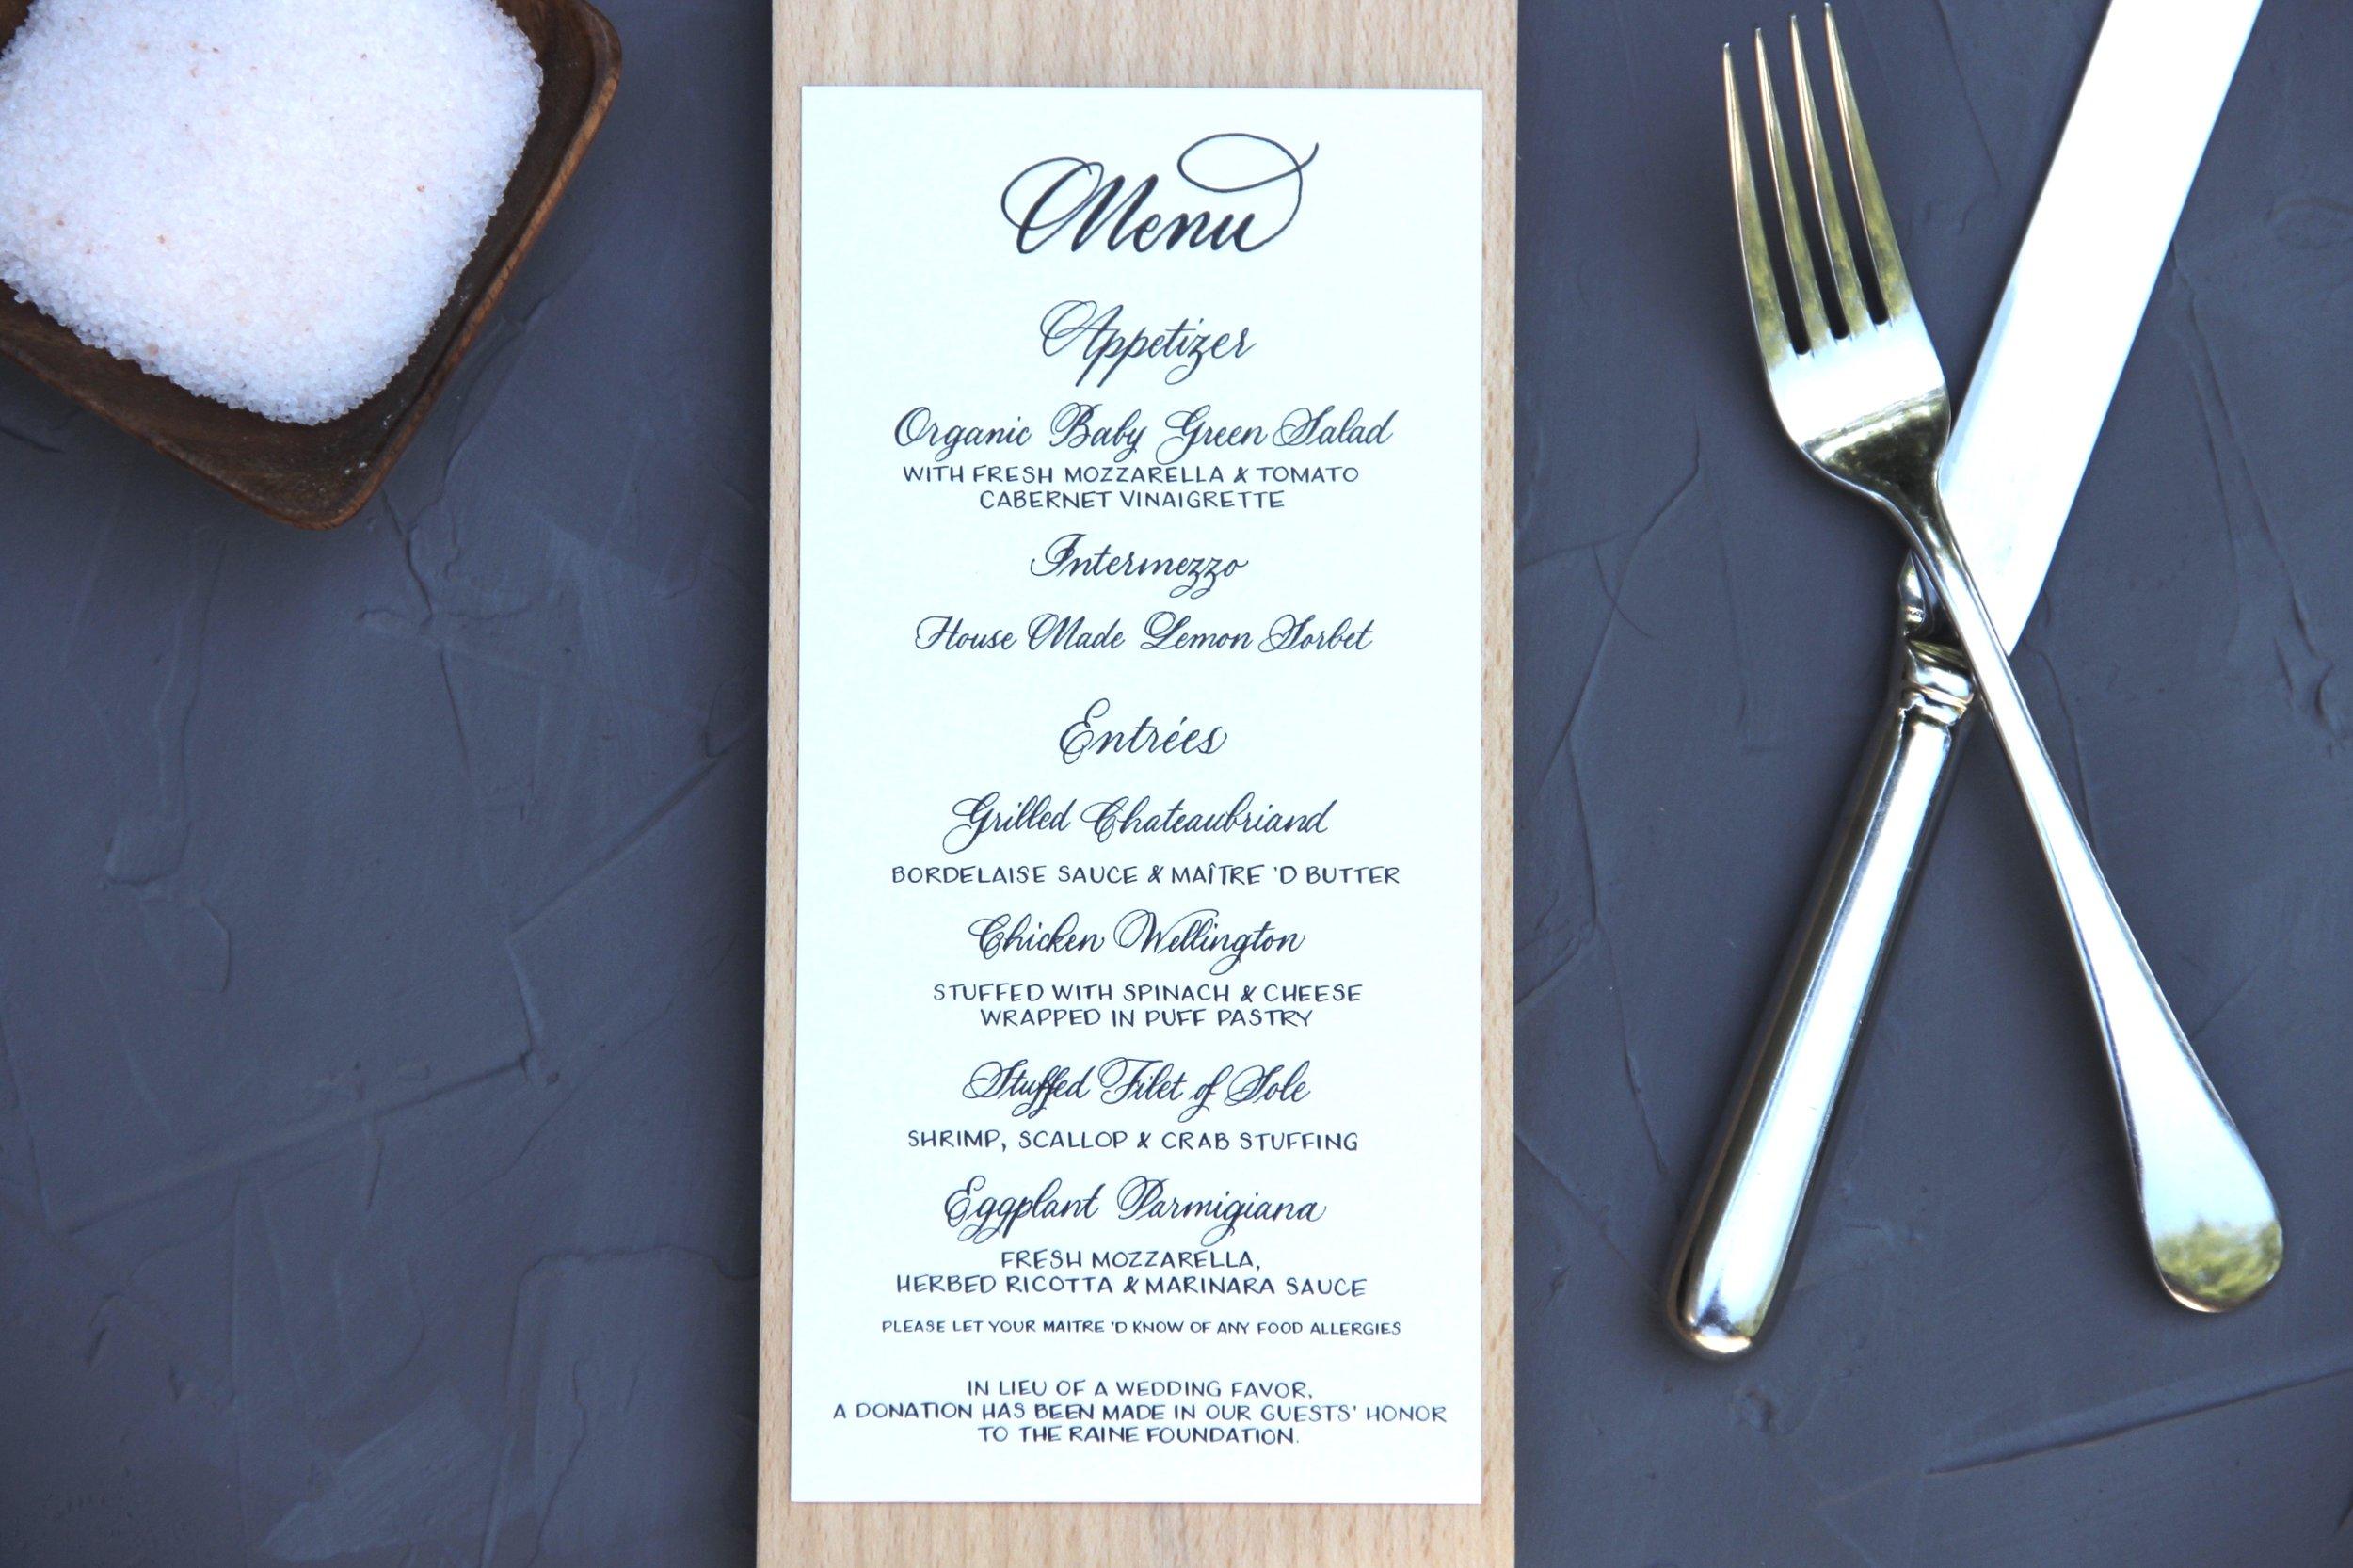 menu 9 copy.jpg